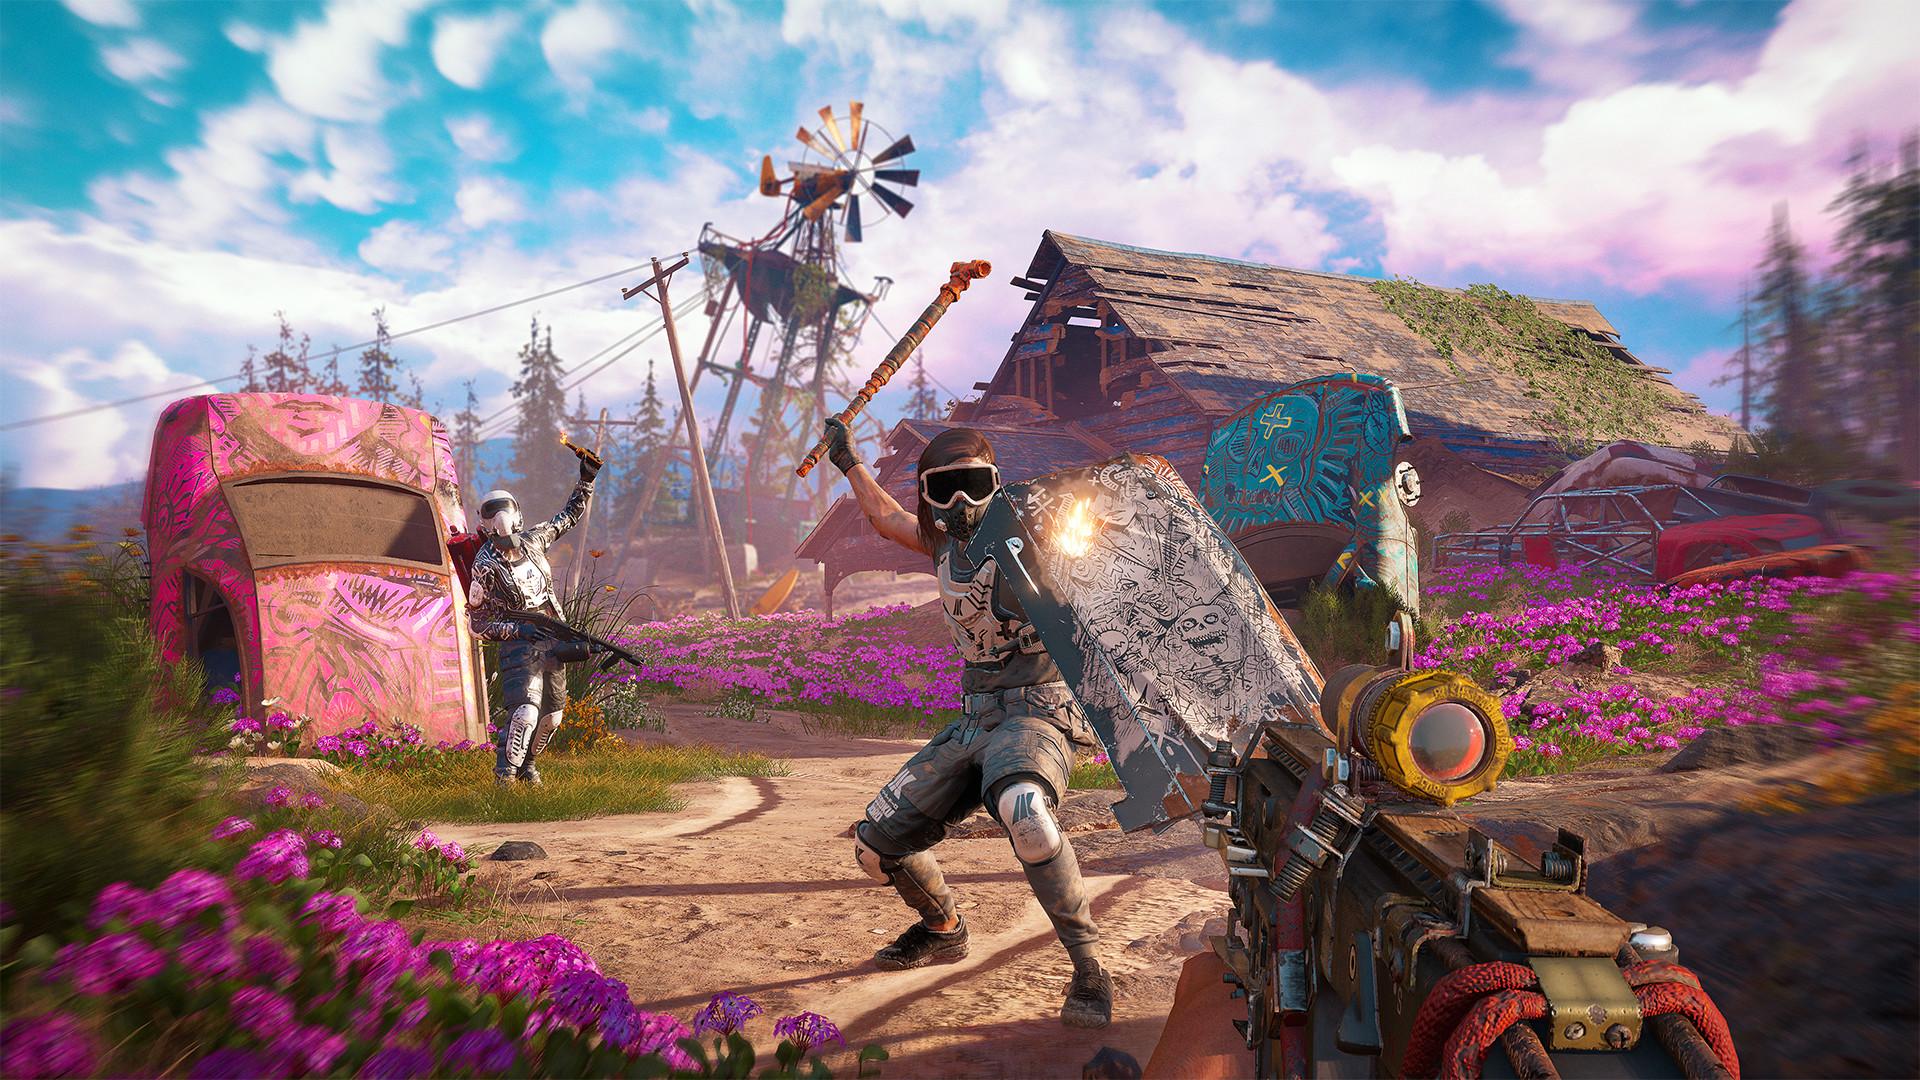 Far Cry New Dawn brings a 'light RPG approach' to the Far Cry series